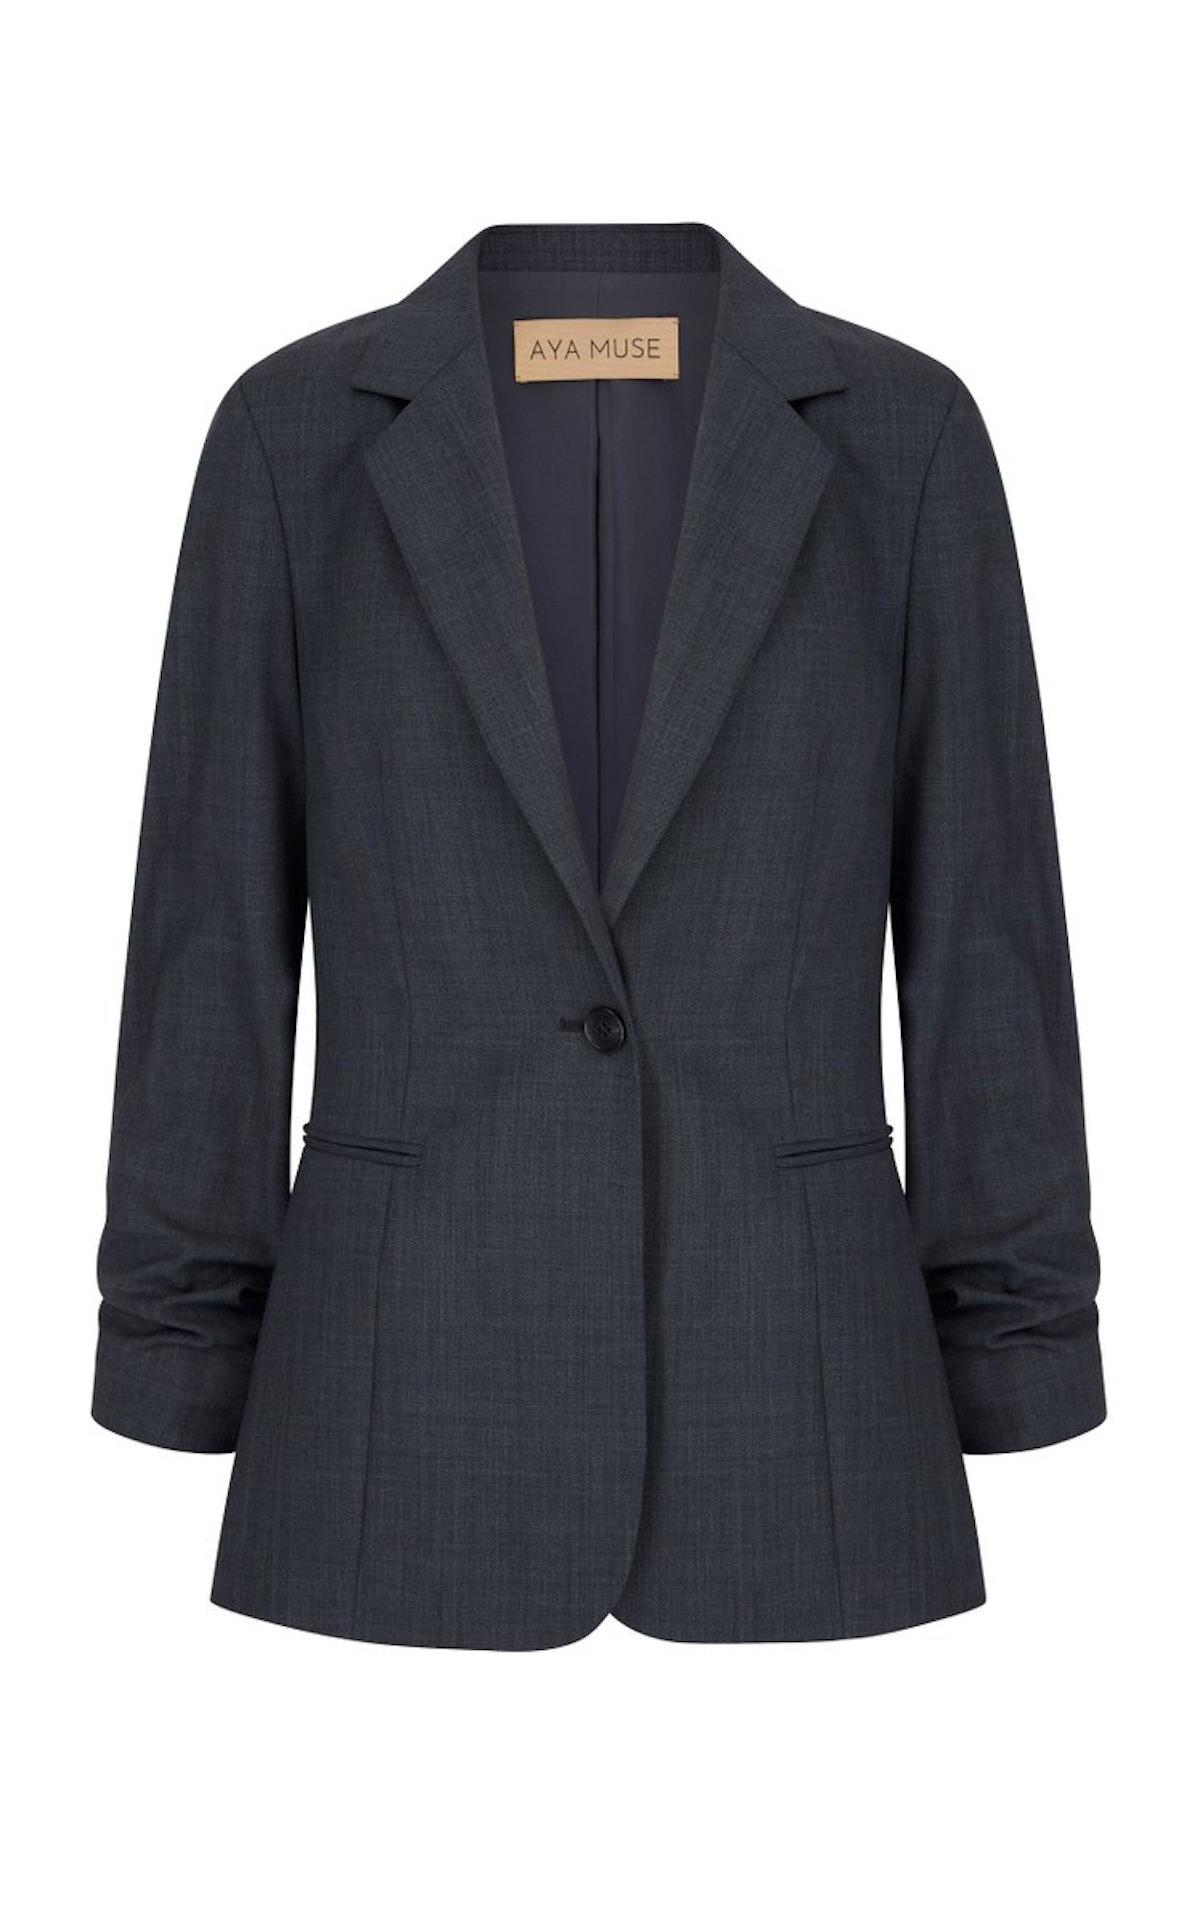 Baojin ruched woven blazer from Aya Muse, available on Moda Operandi.